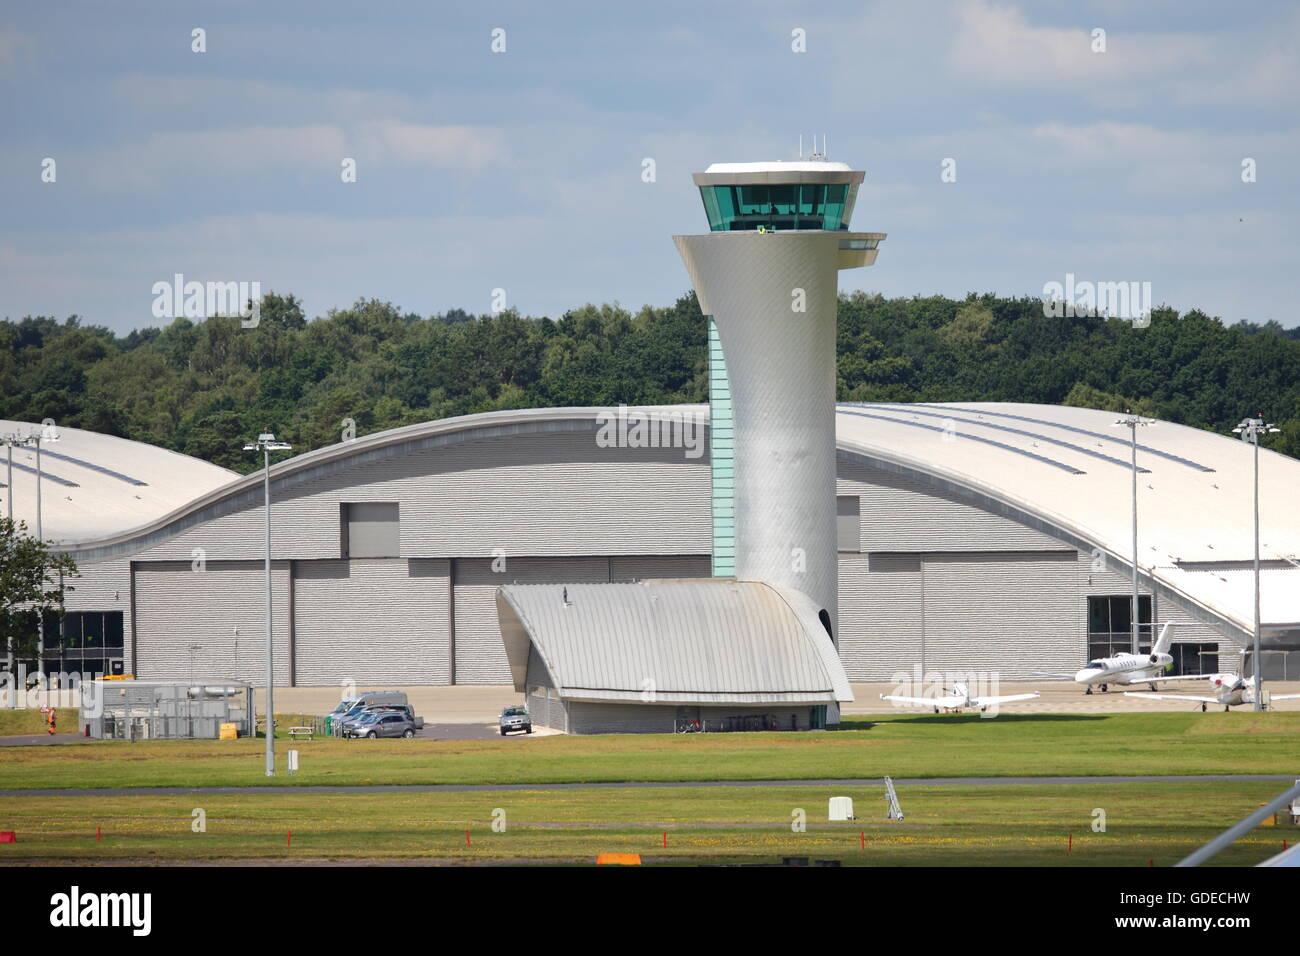 Air traffic control tower at Farnborough airport - Stock Image